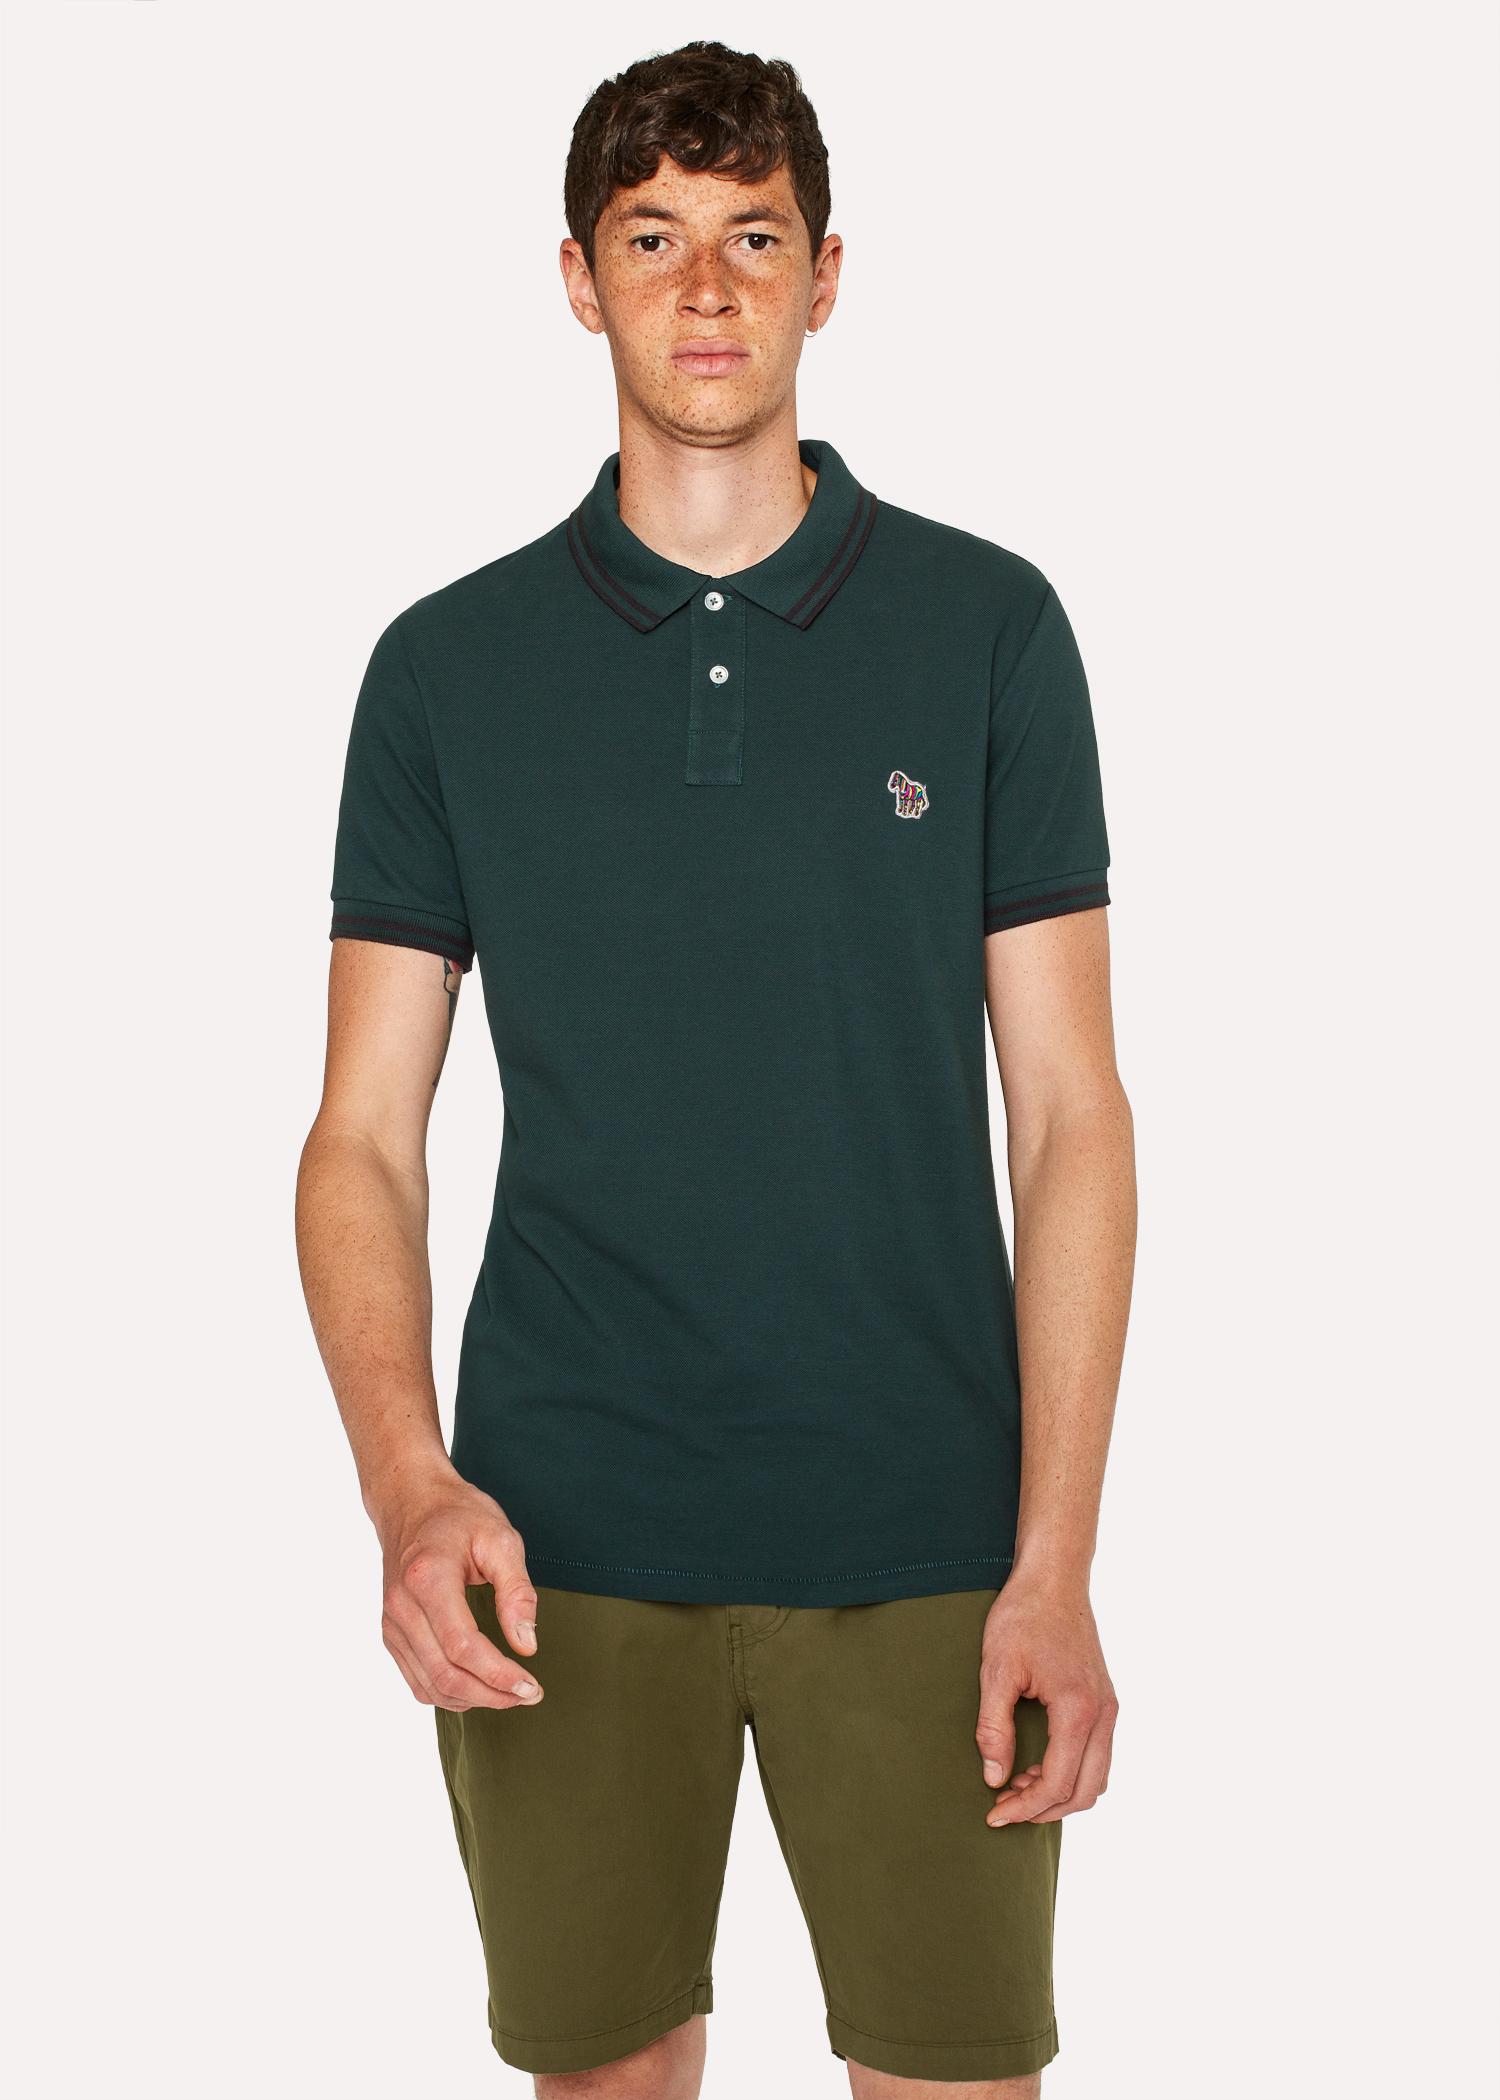 Mens Slim Fit Dark Green Zebra Polo Shirt With Black Tipping Paul